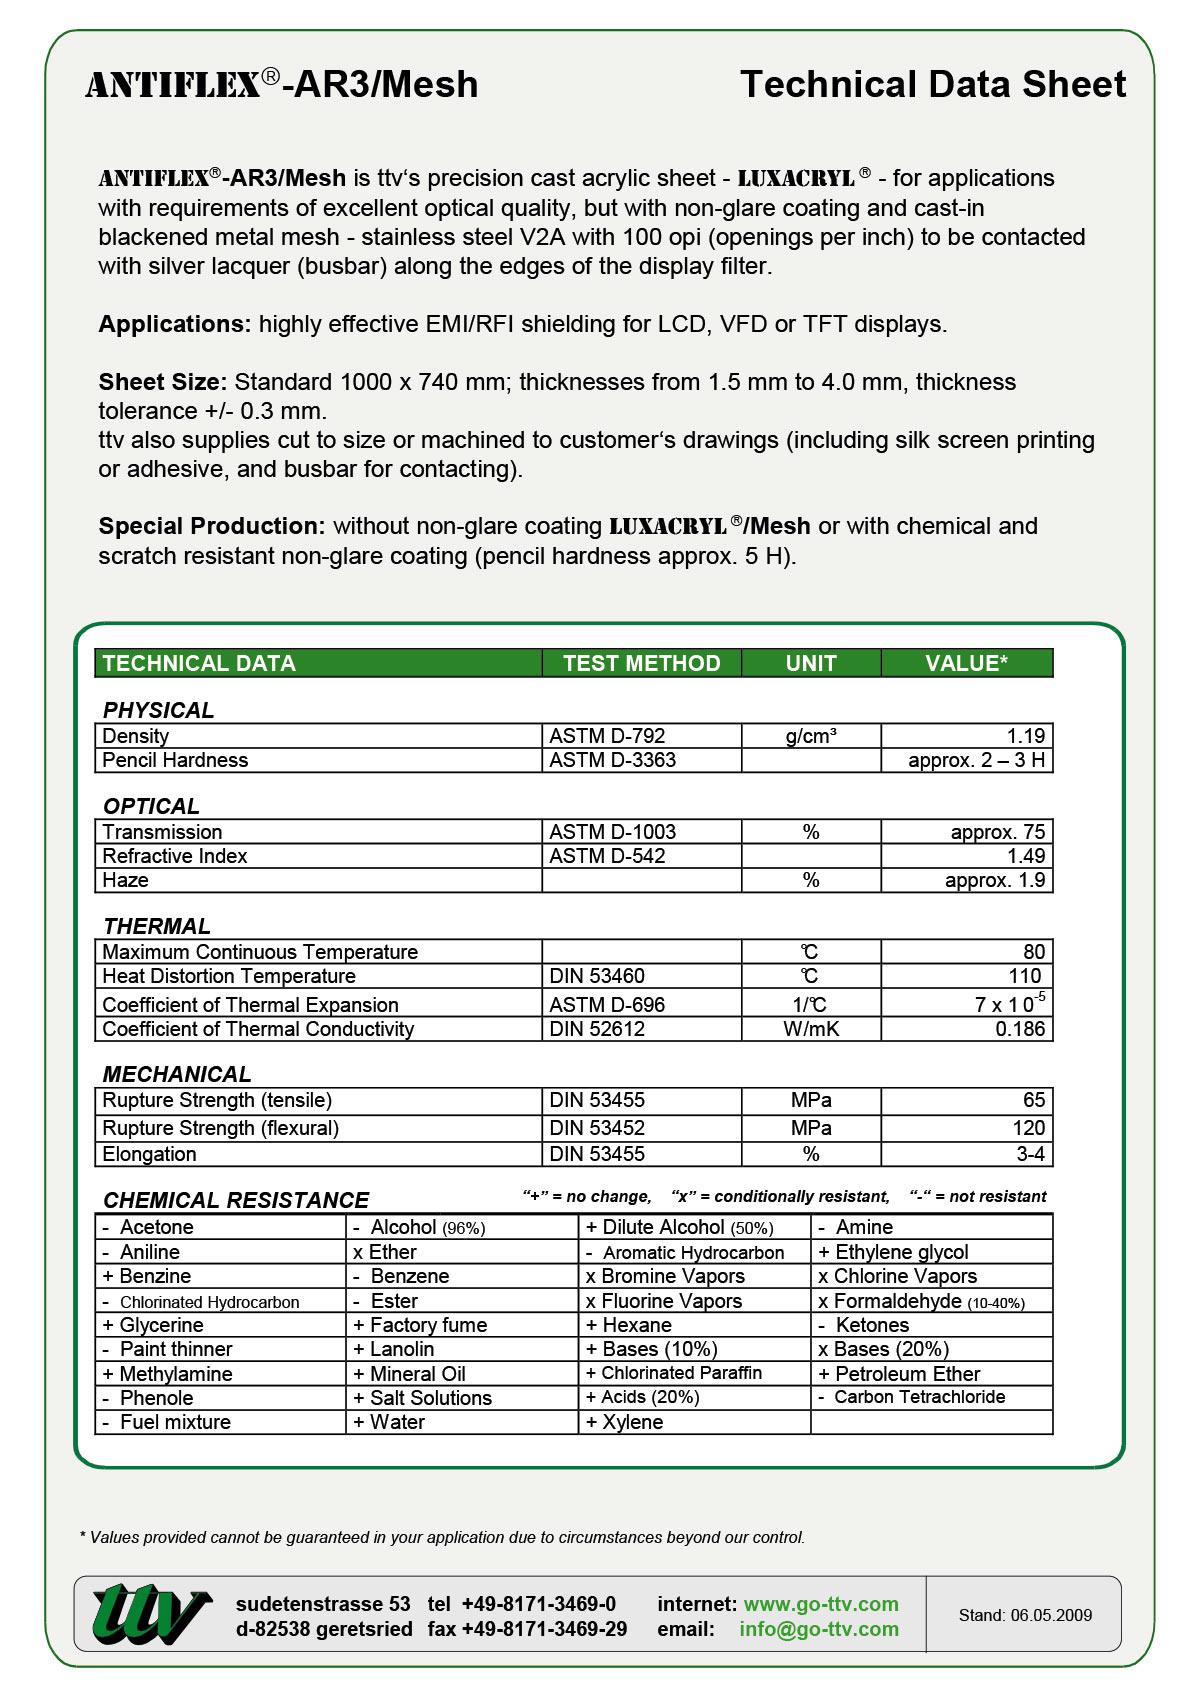 ANTIFLEX-AR3/Mesh Data sheet